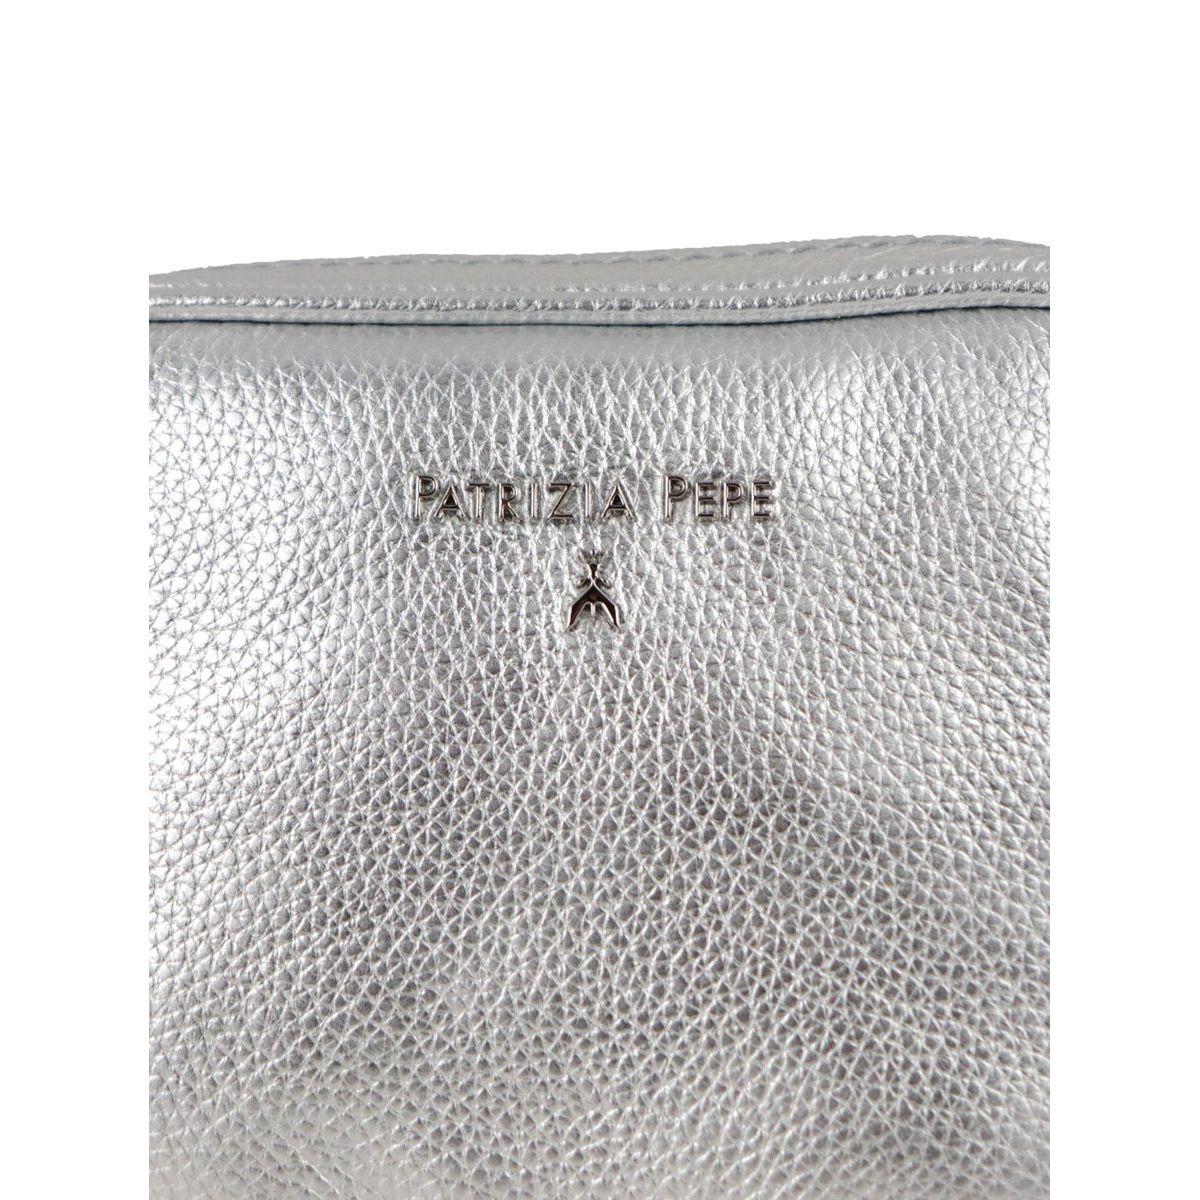 Shoulder strap in metal leather Silver Patrizia Pepe